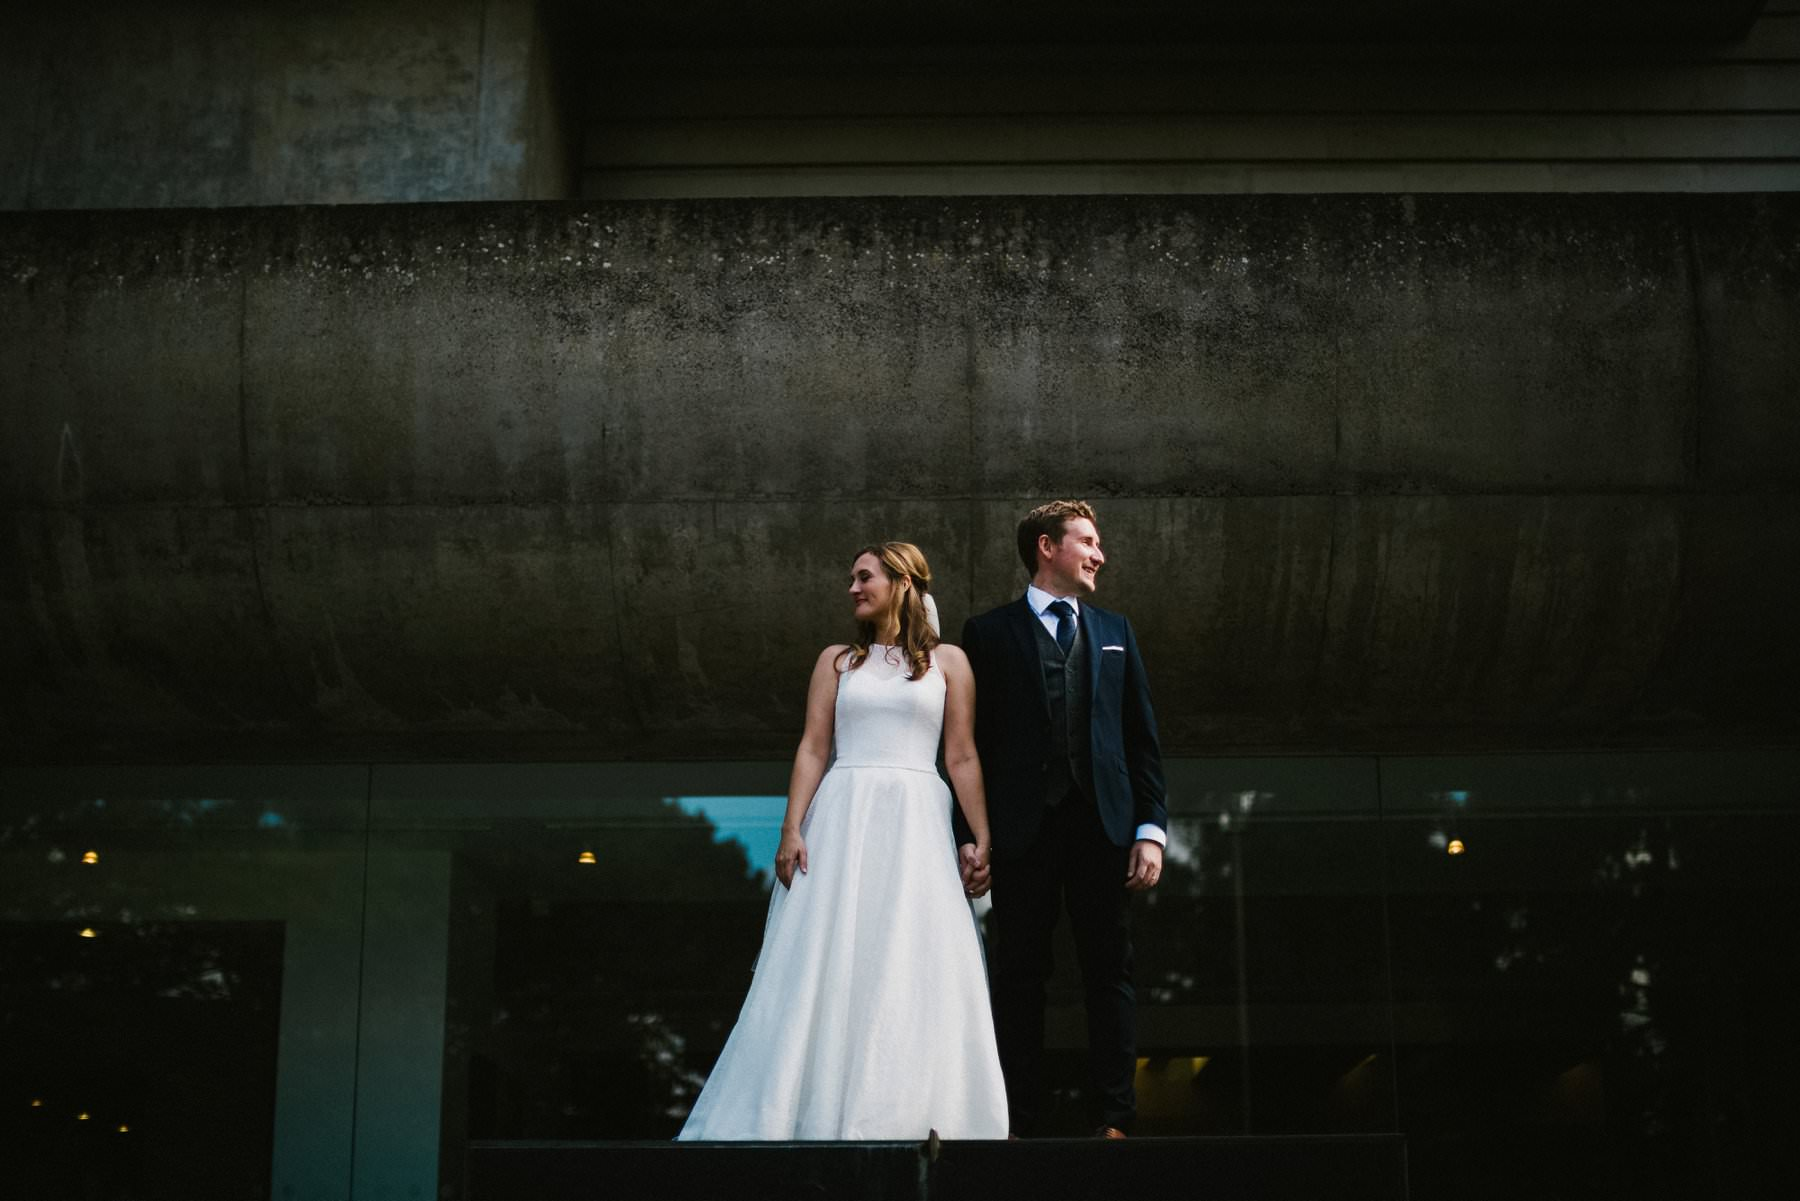 Ulster museum wedding photography